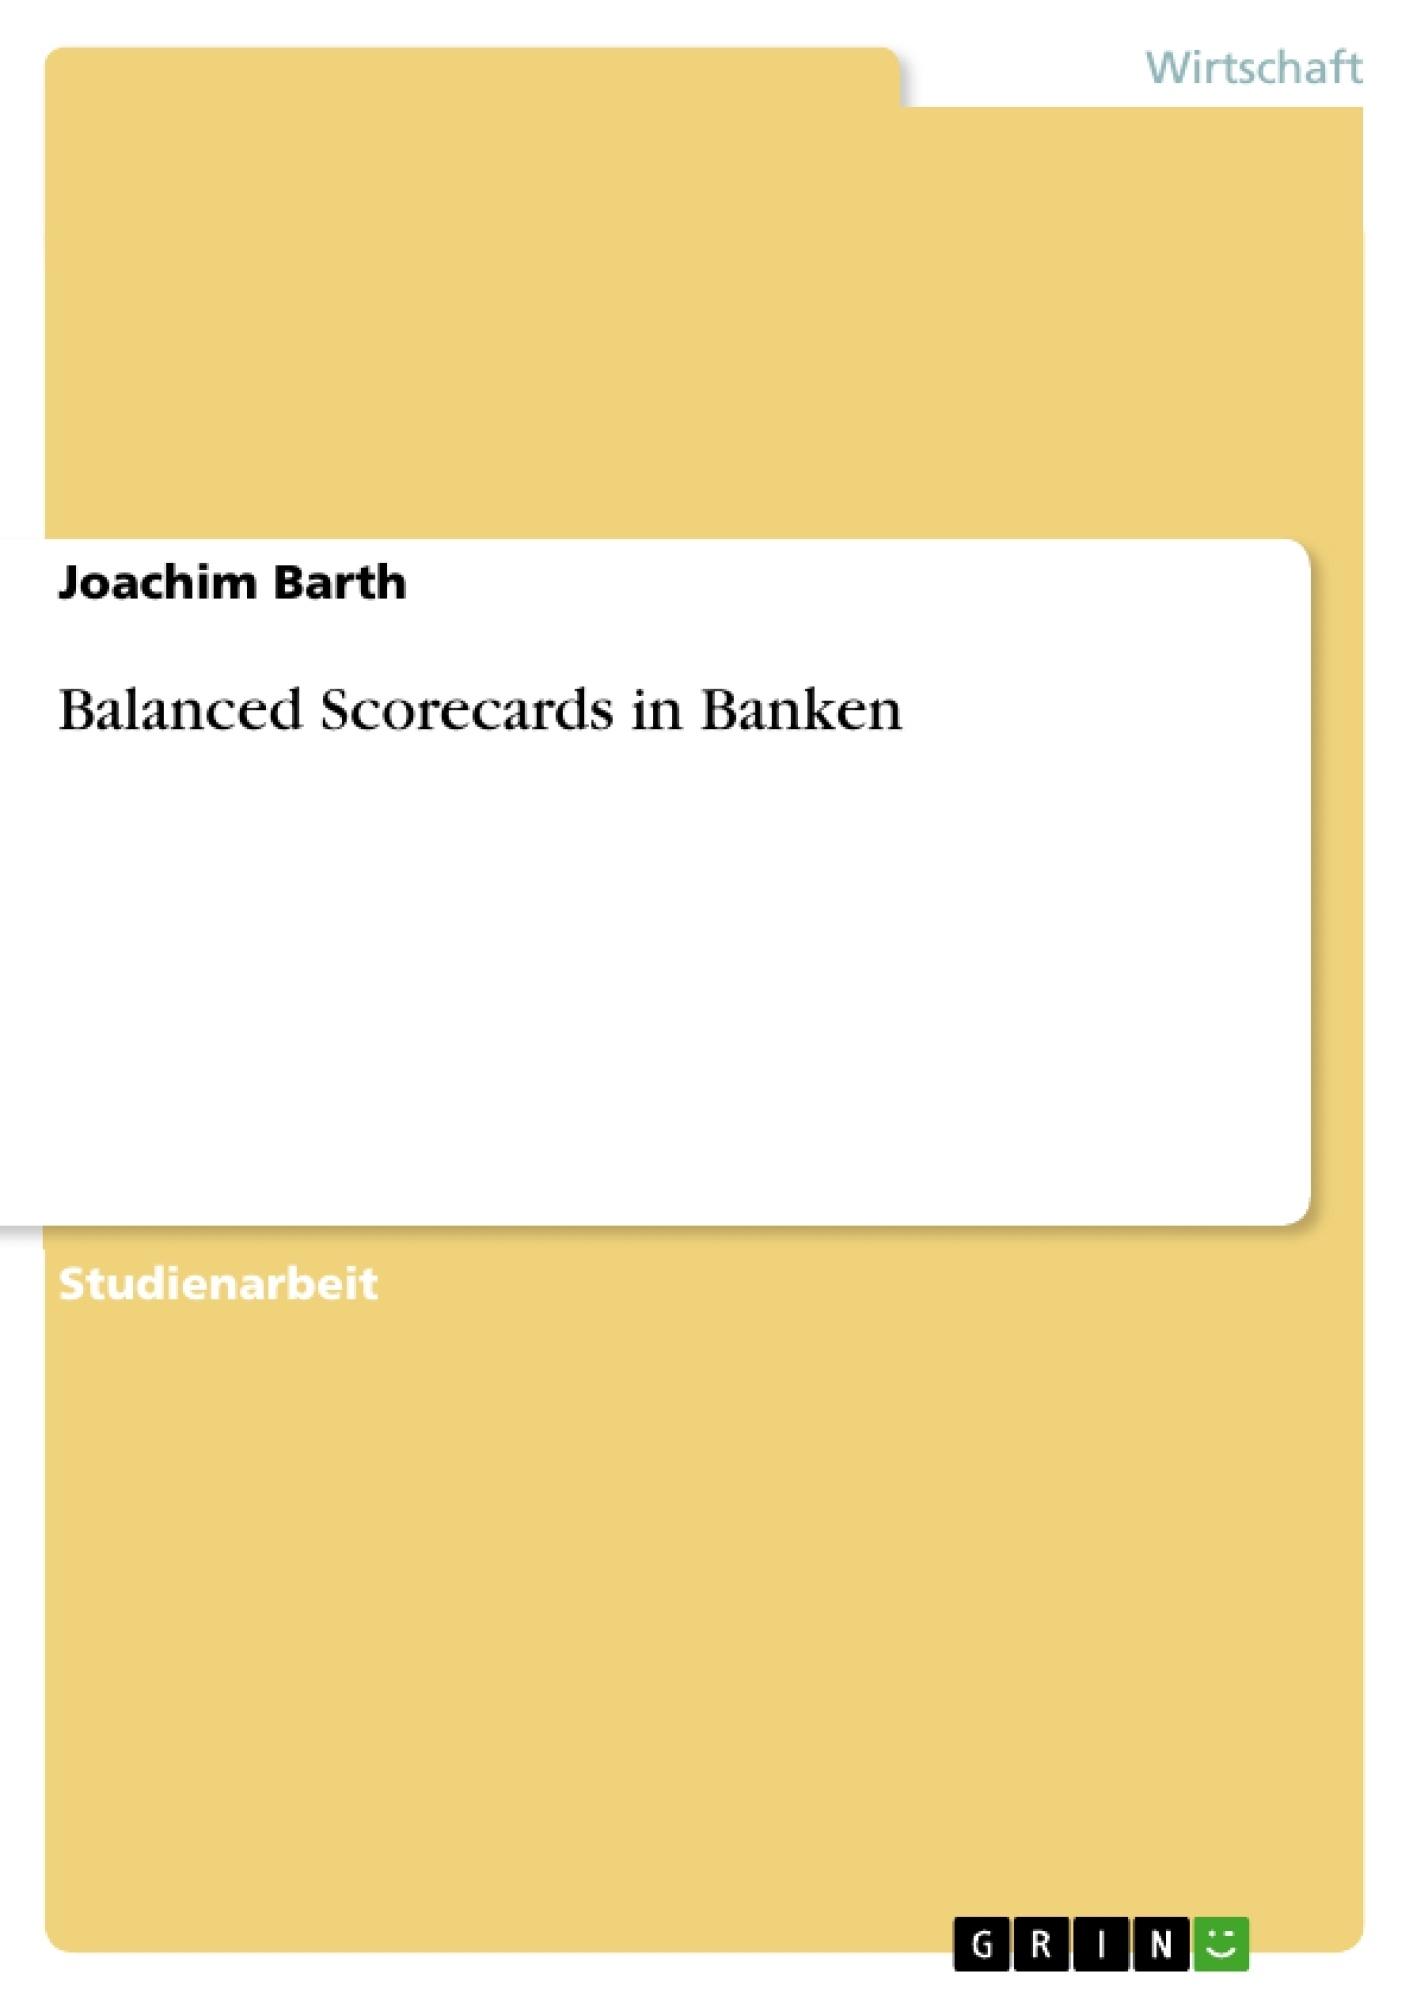 Titel: Balanced Scorecards in Banken